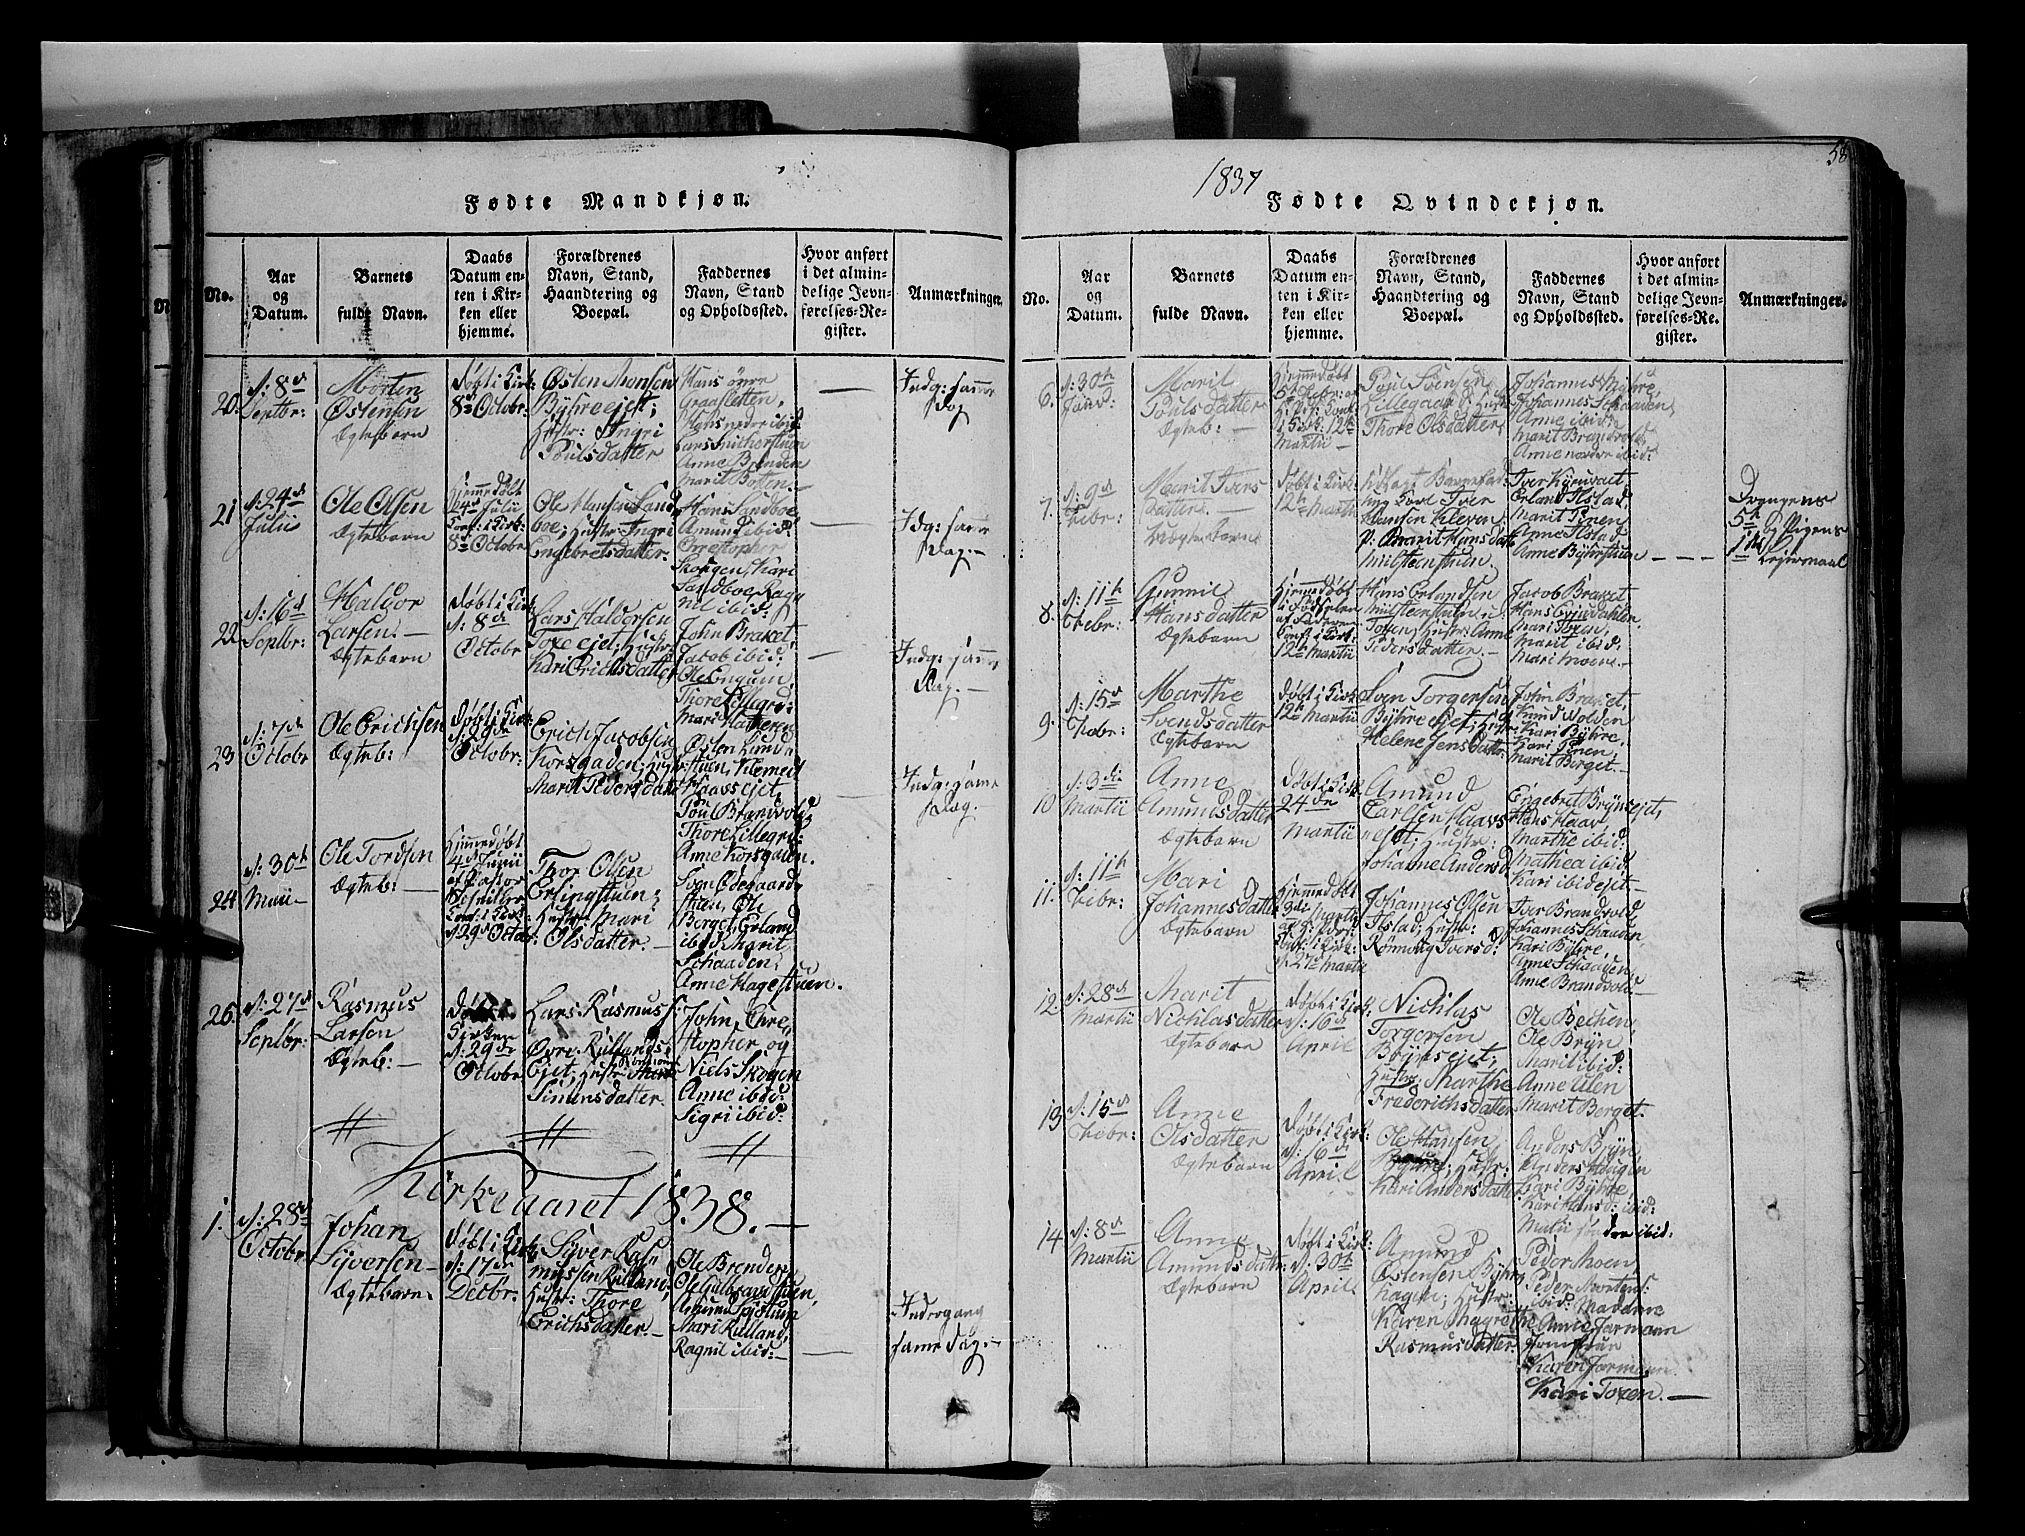 SAH, Fron prestekontor, H/Ha/Hab/L0004: Klokkerbok nr. 4, 1816-1850, s. 58